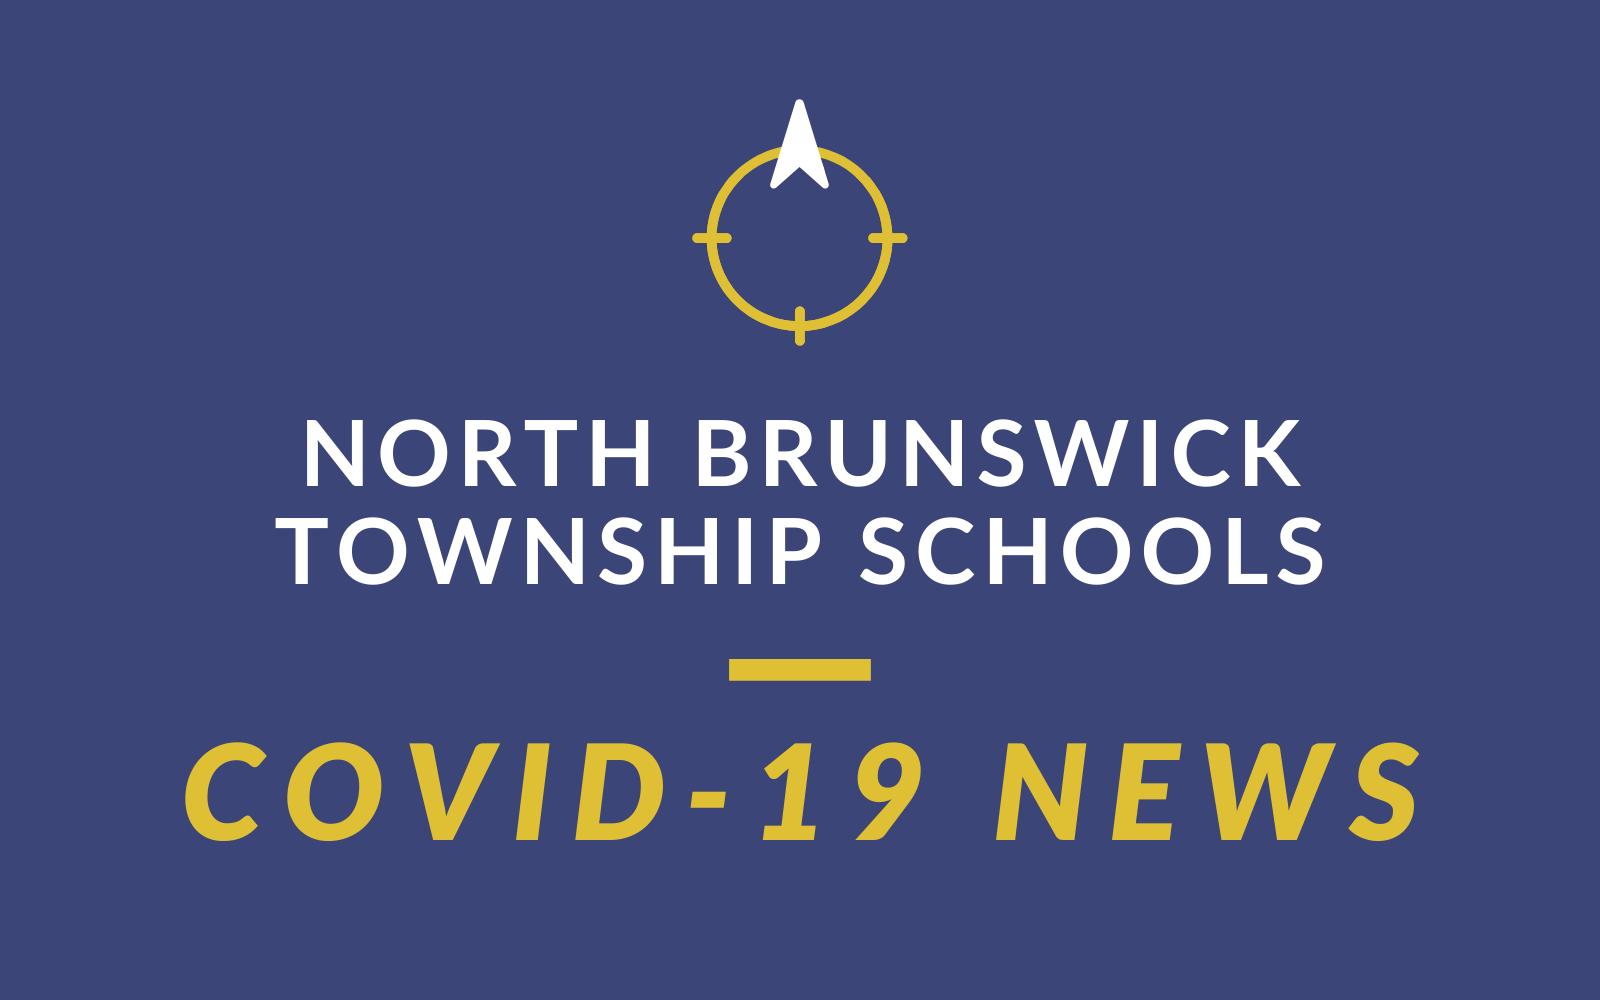 NORTH BRUNSWICK TOWNSHIP SCHOOLS - COVID-19 NEWS